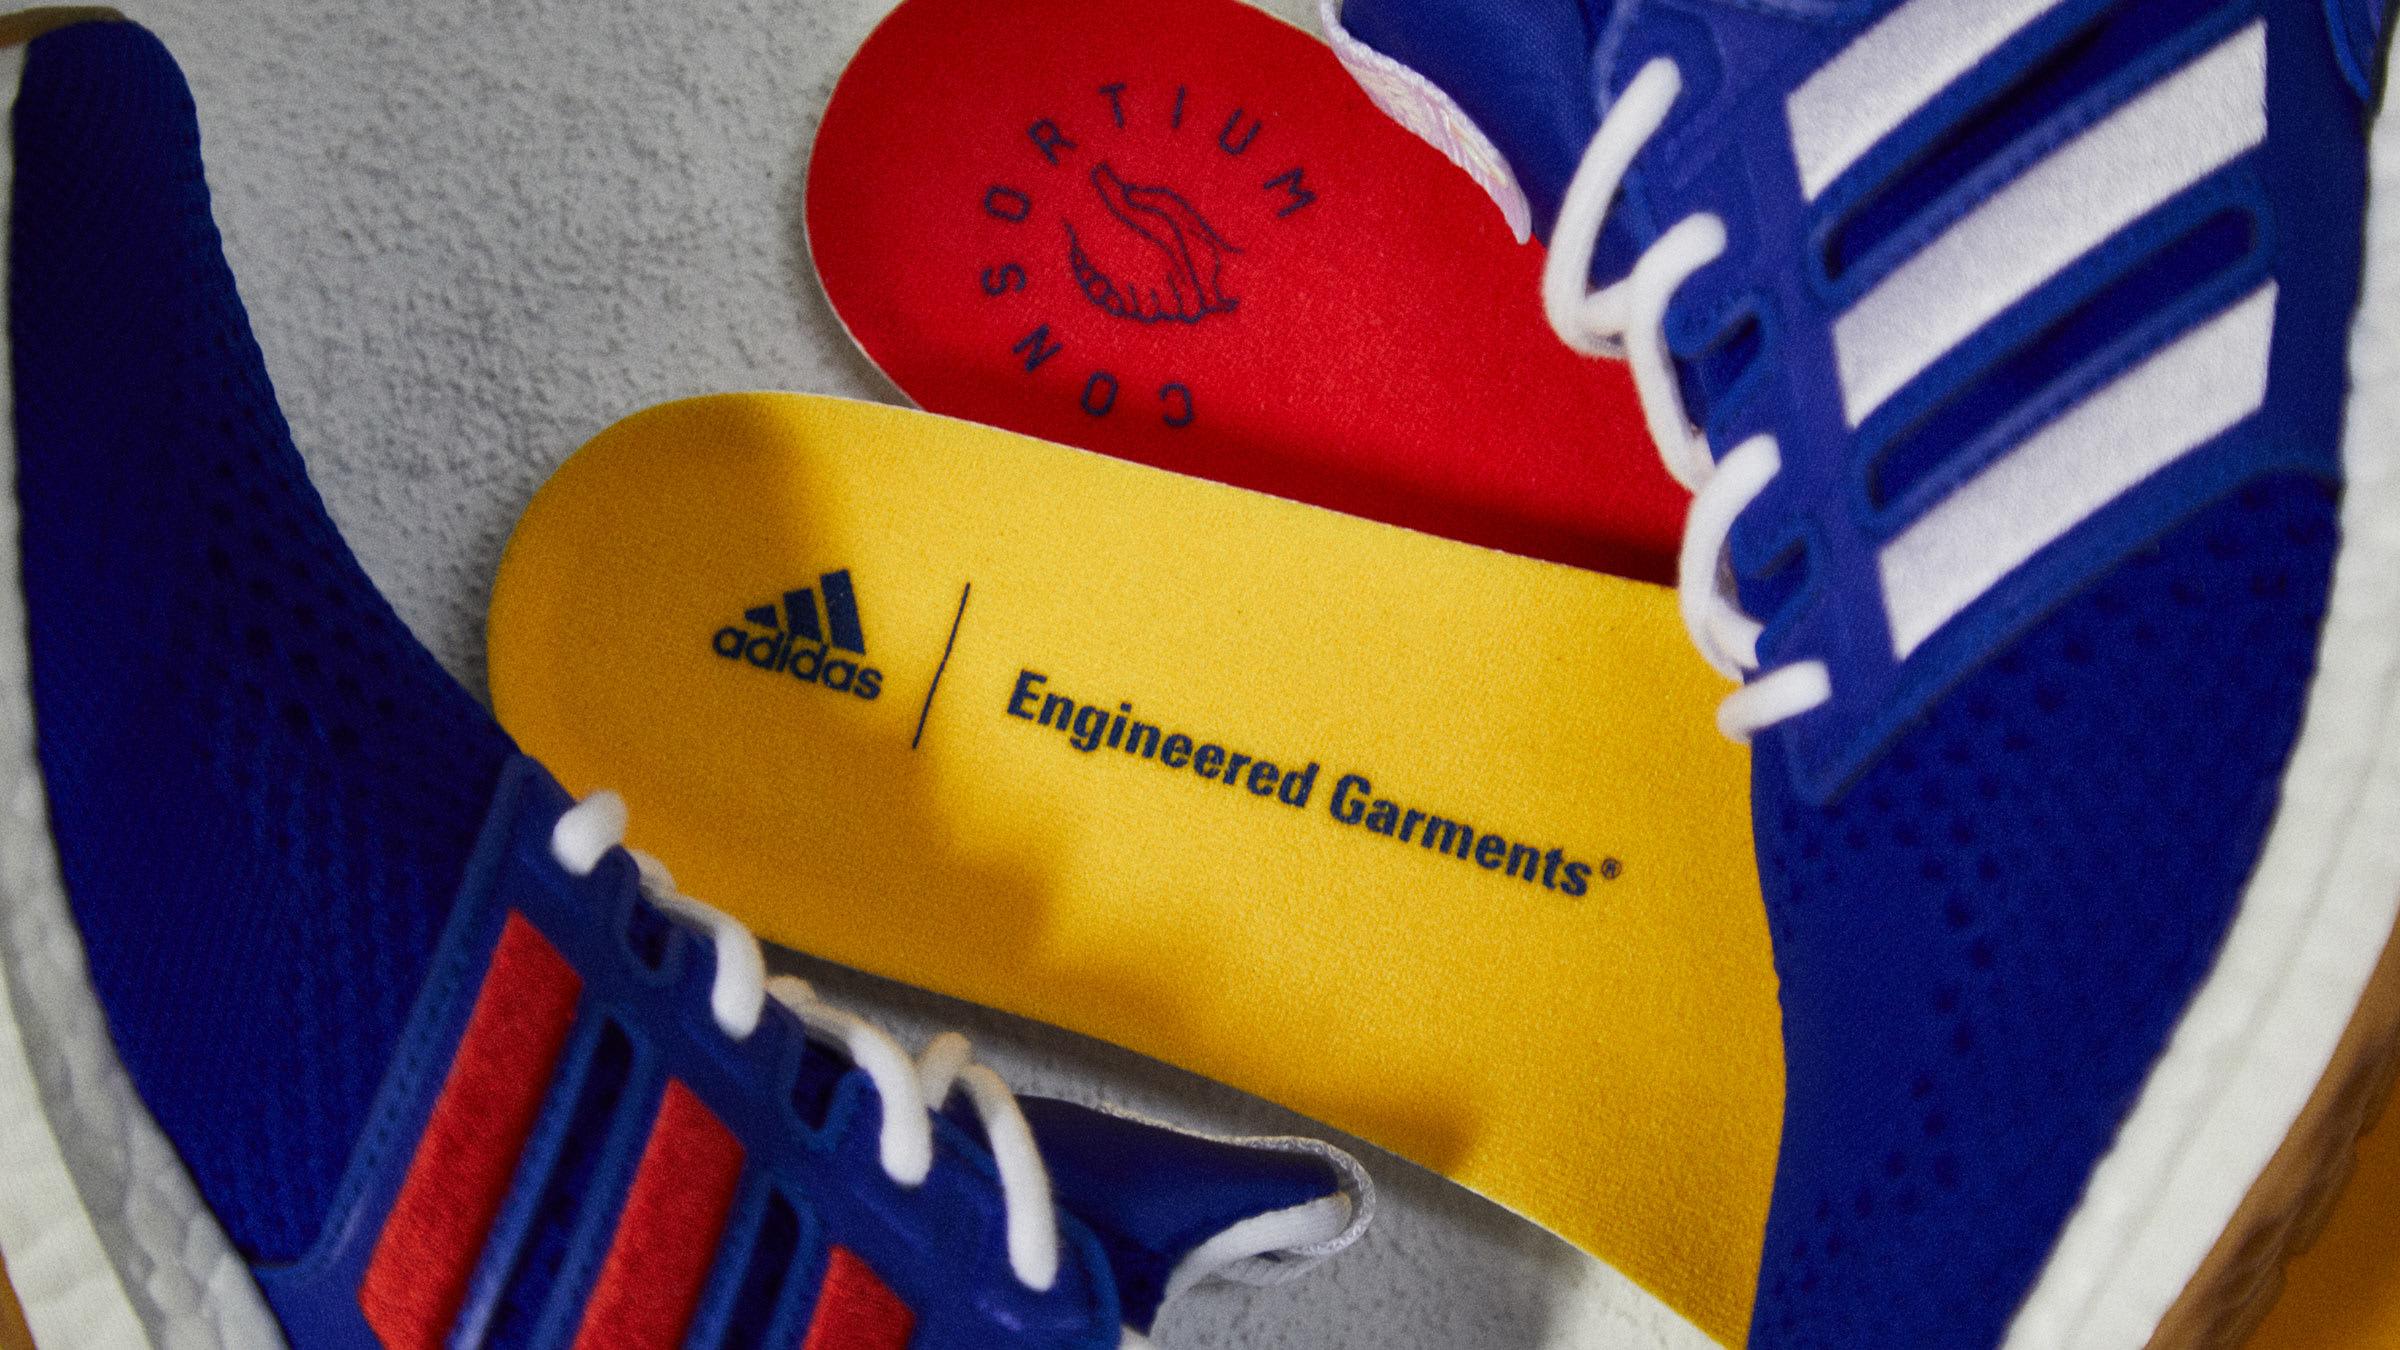 246848b638675 Adidas Consortium x Engineered Garments Ultra Boost (Blue